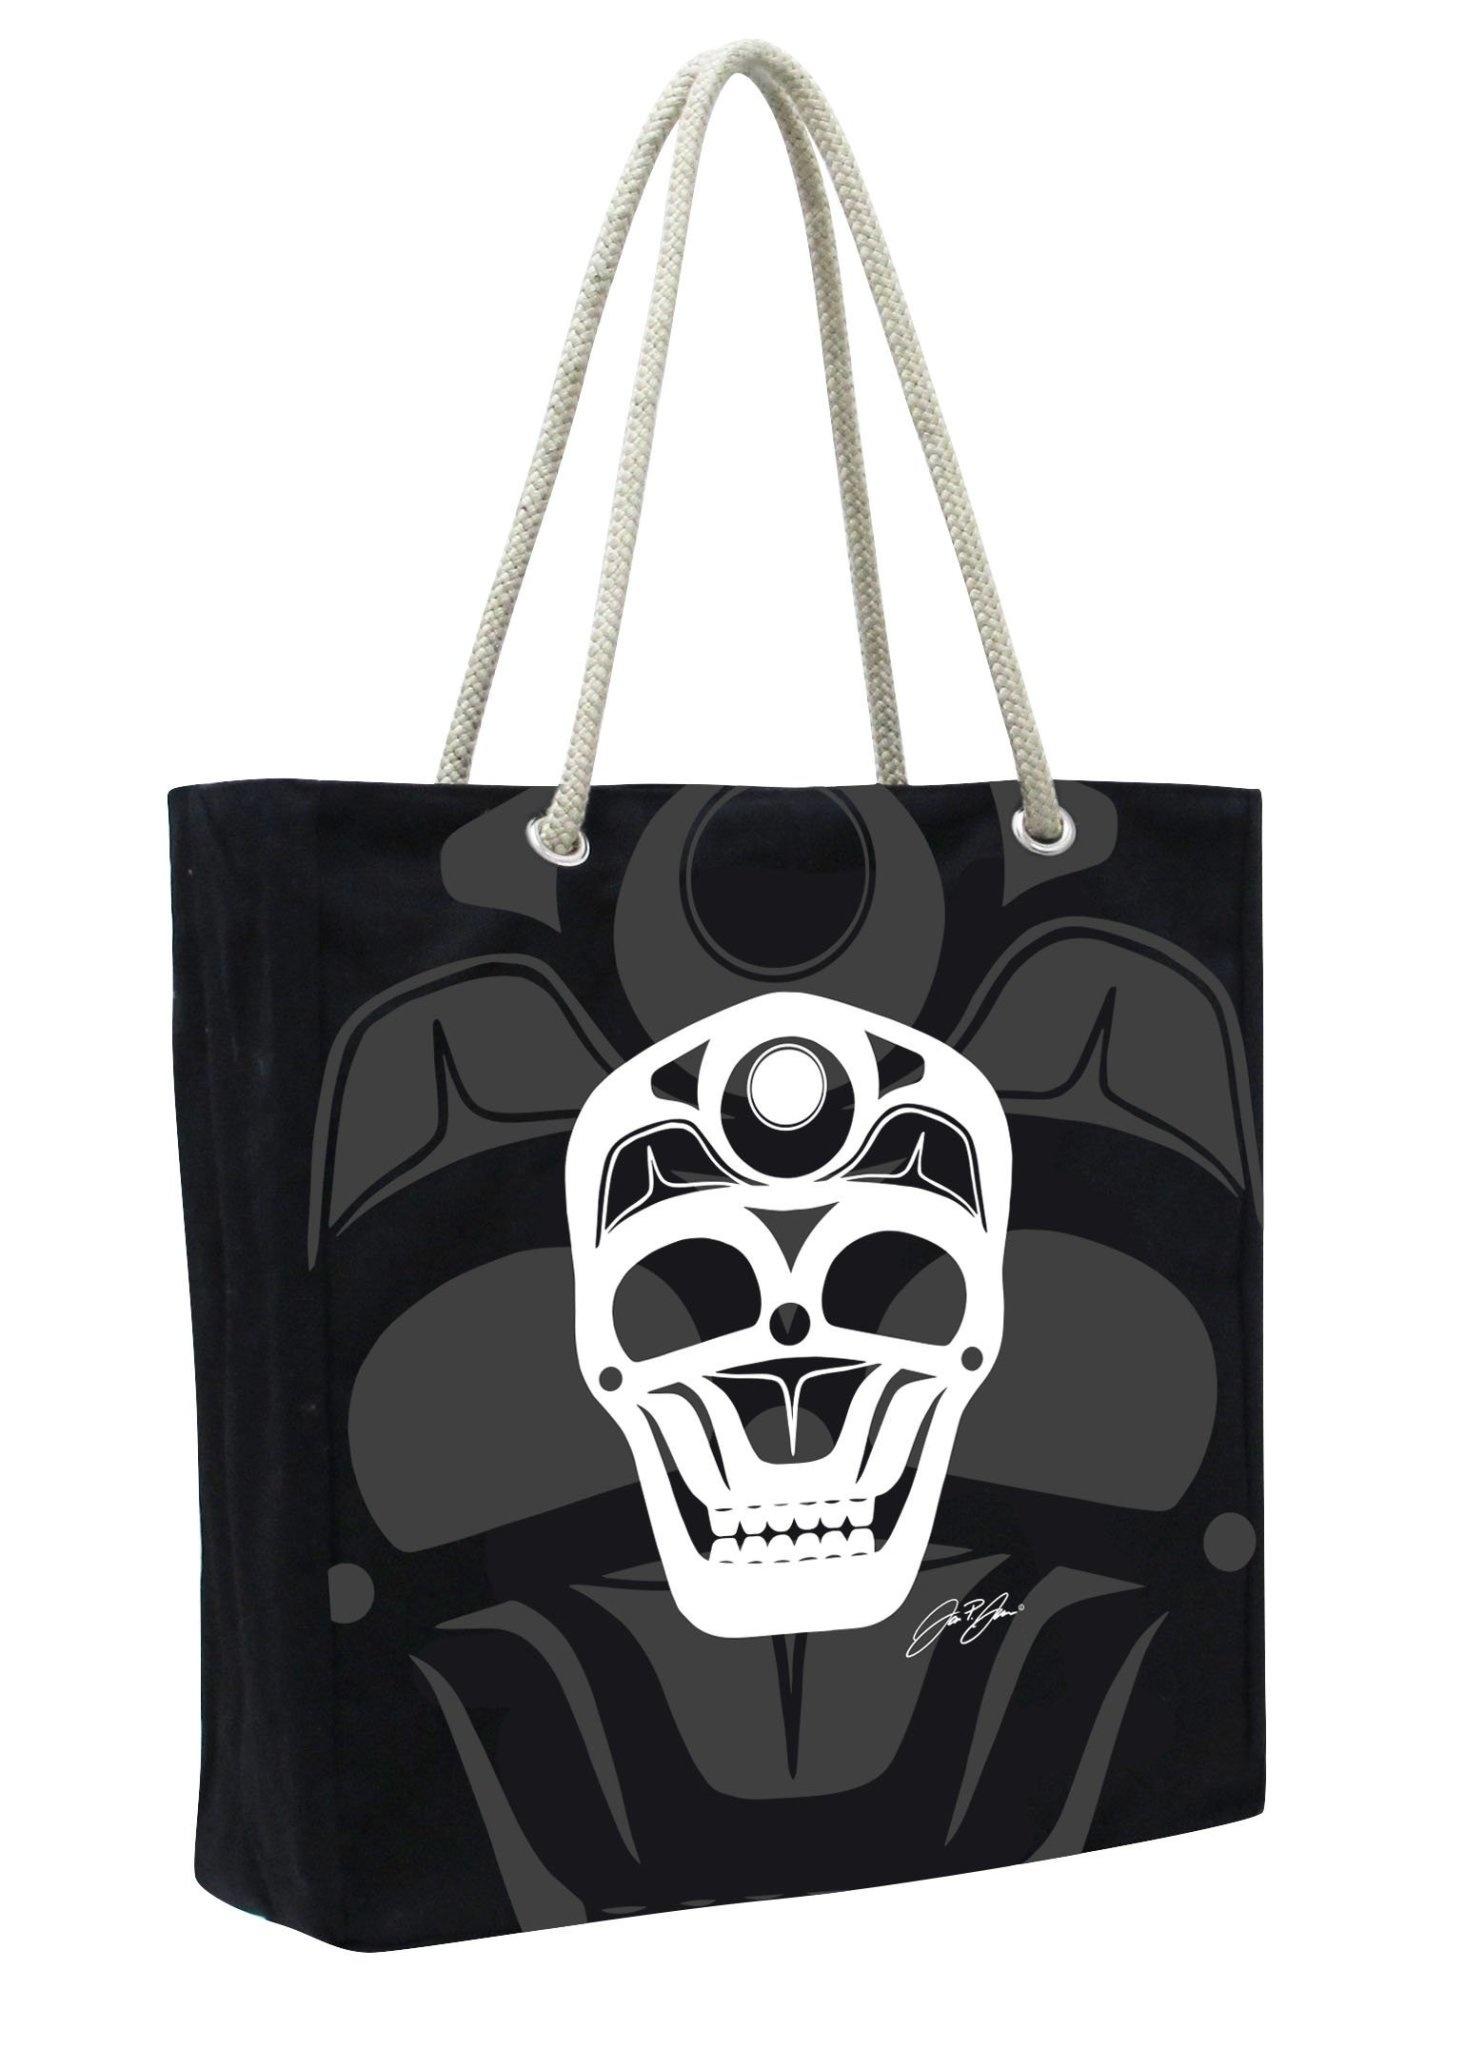 Eco Tote - Skull by James Johnson-1